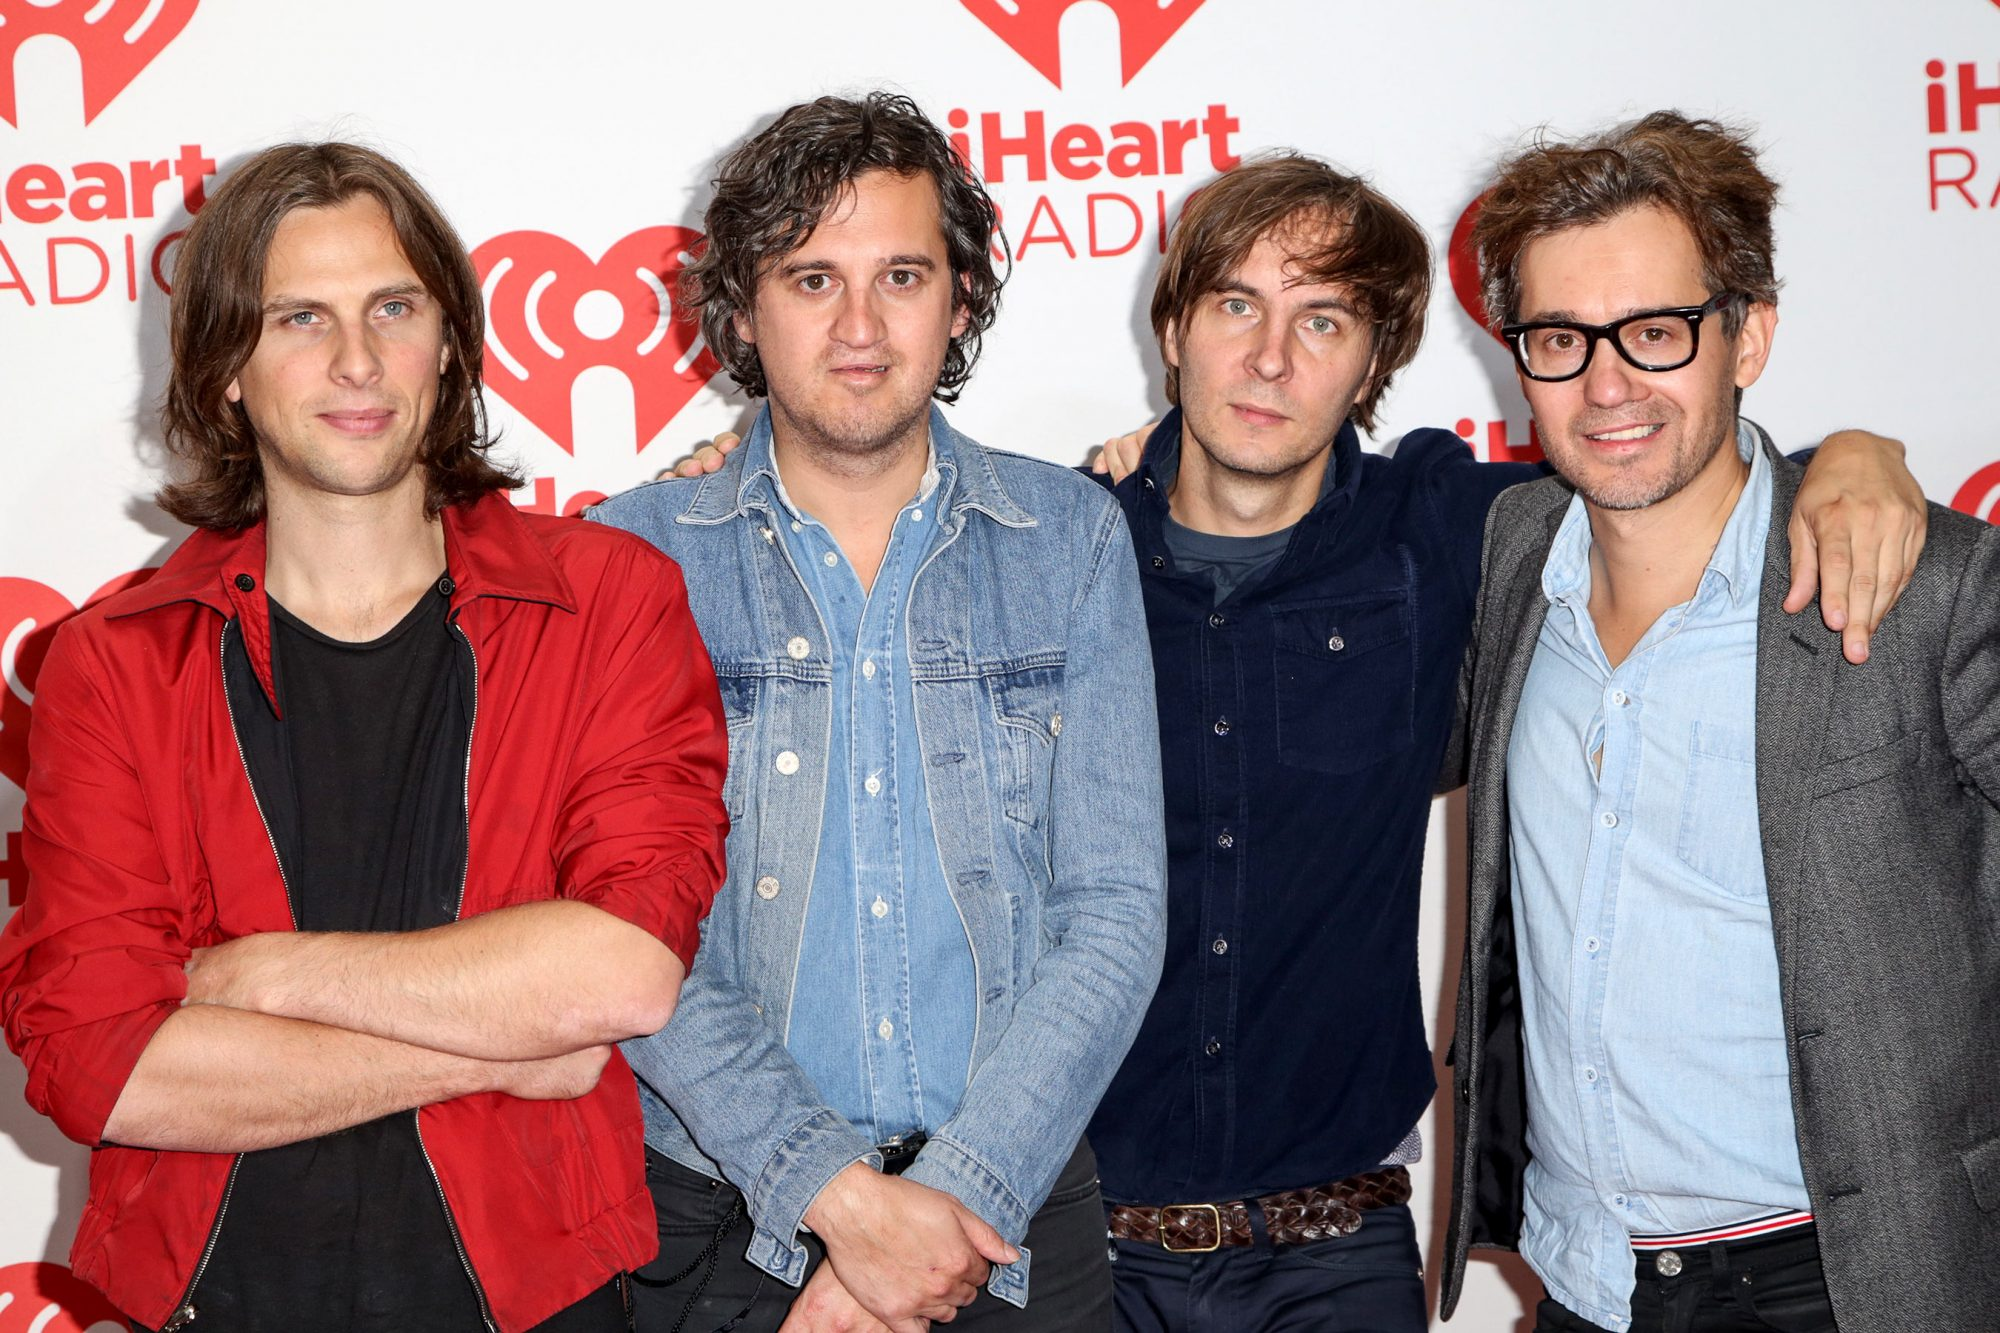 iHeartRadio Music Festival 2013 - Photo Room - Day 2